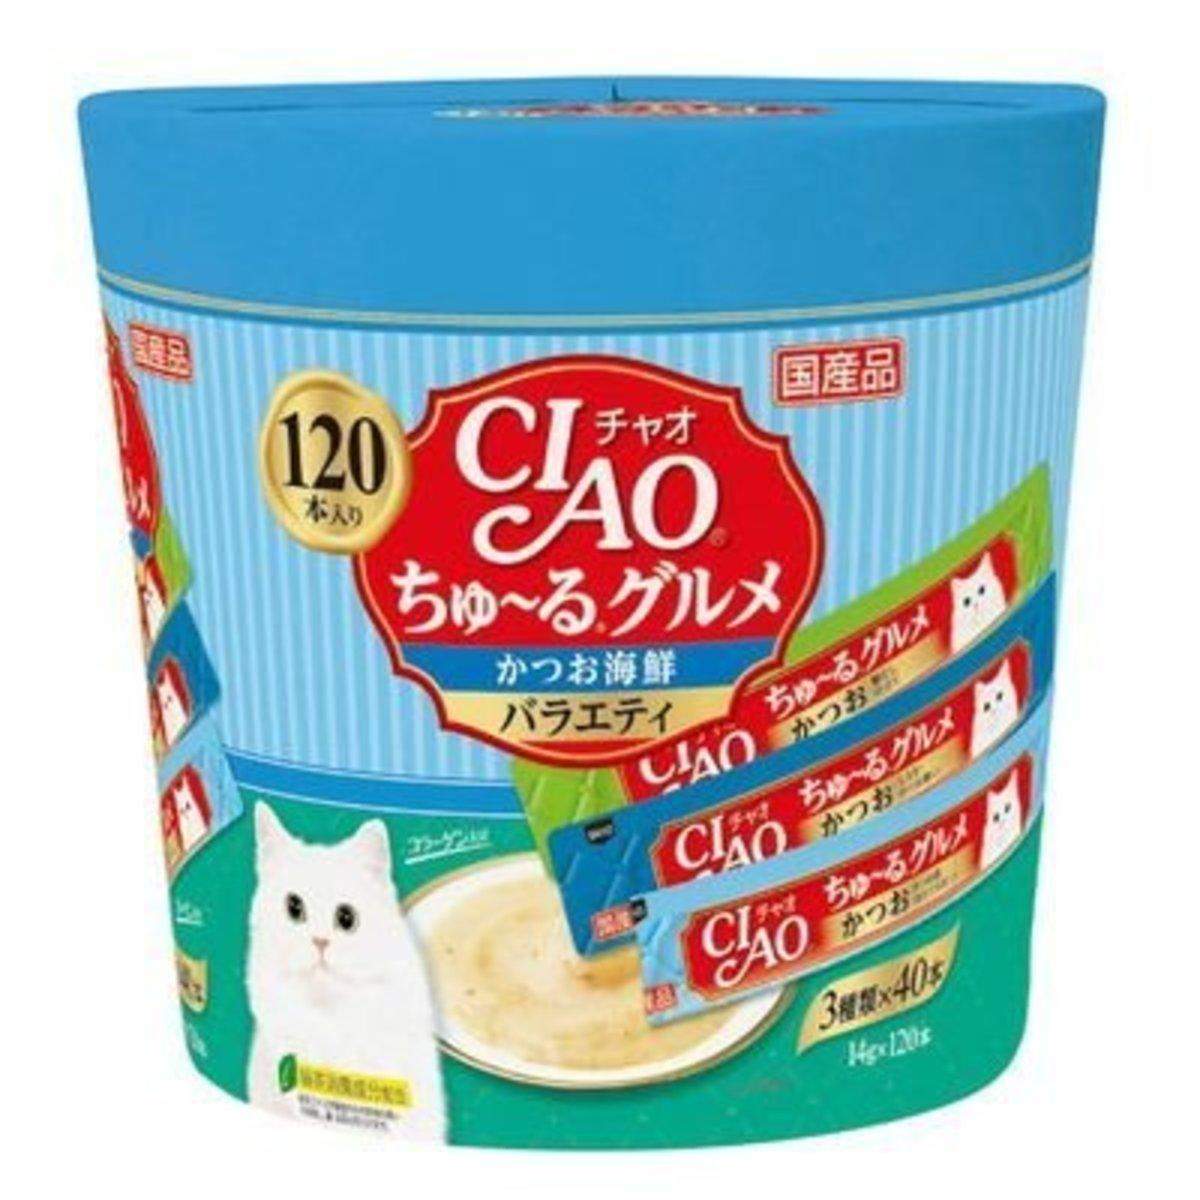 CIAO Churu Cat Food Treat Paste Party Mix - Seafood 14g x120p [Blue]